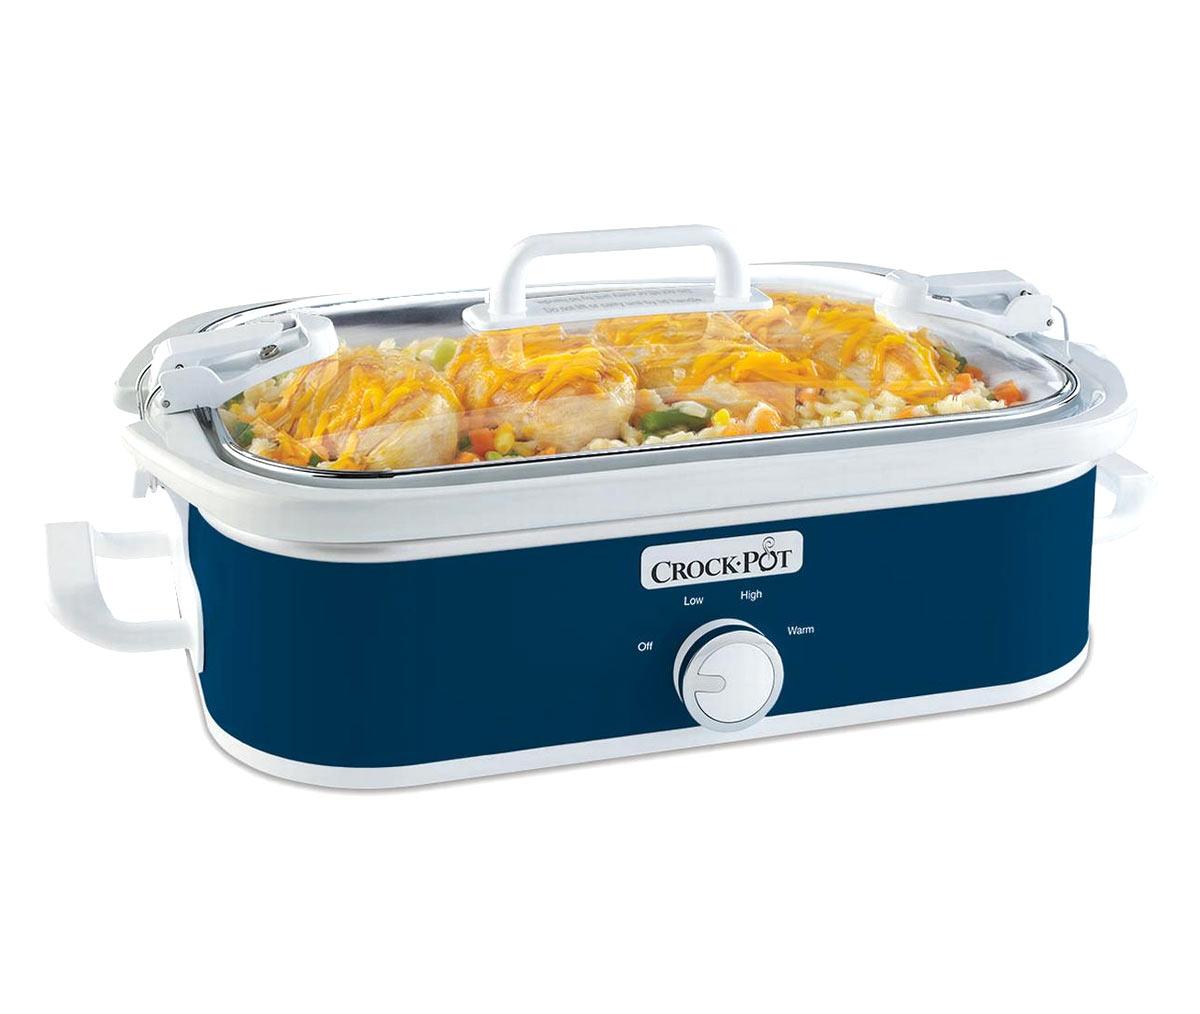 Crock-Pot Original Slow Cooker- Blue